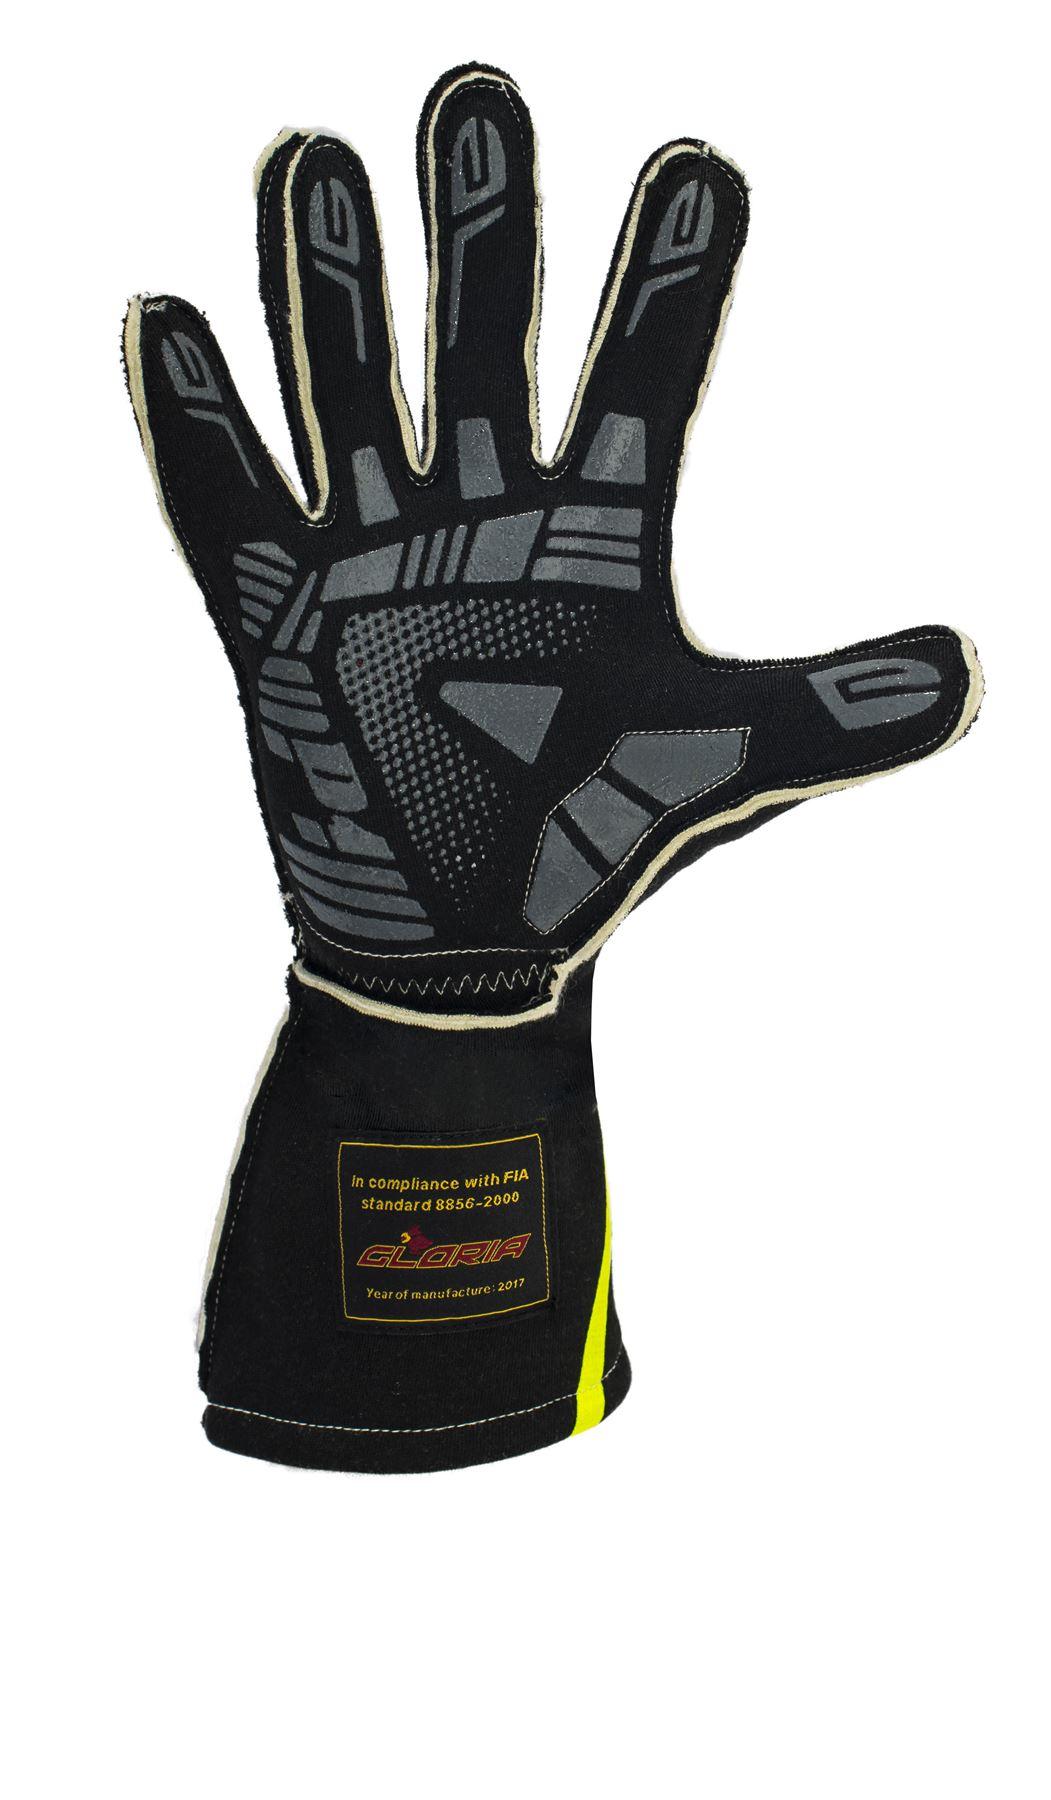 Indexbild 4 - P1-Racewear-Grip-2-Race-Rally-Nomex-Gloves-FIA-Approved